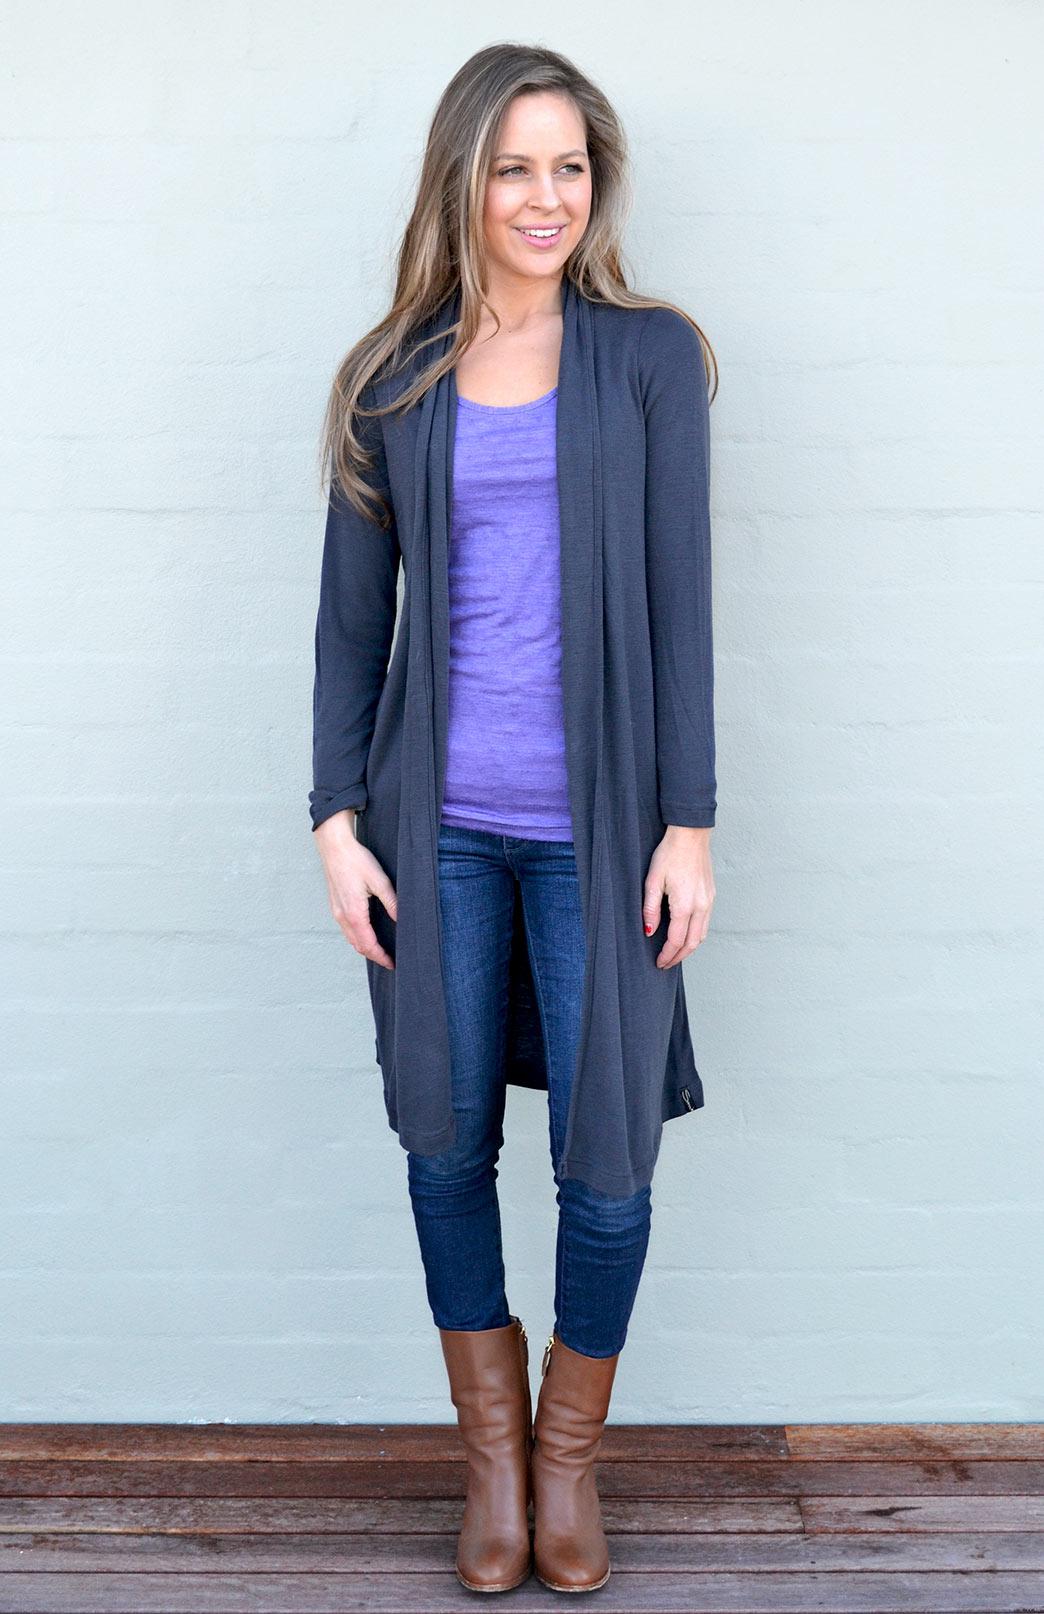 Long Drape Cardigan - Women's Steel Grey Lightweight Merino Wool Long Drape - Smitten Merino Tasmania Australia